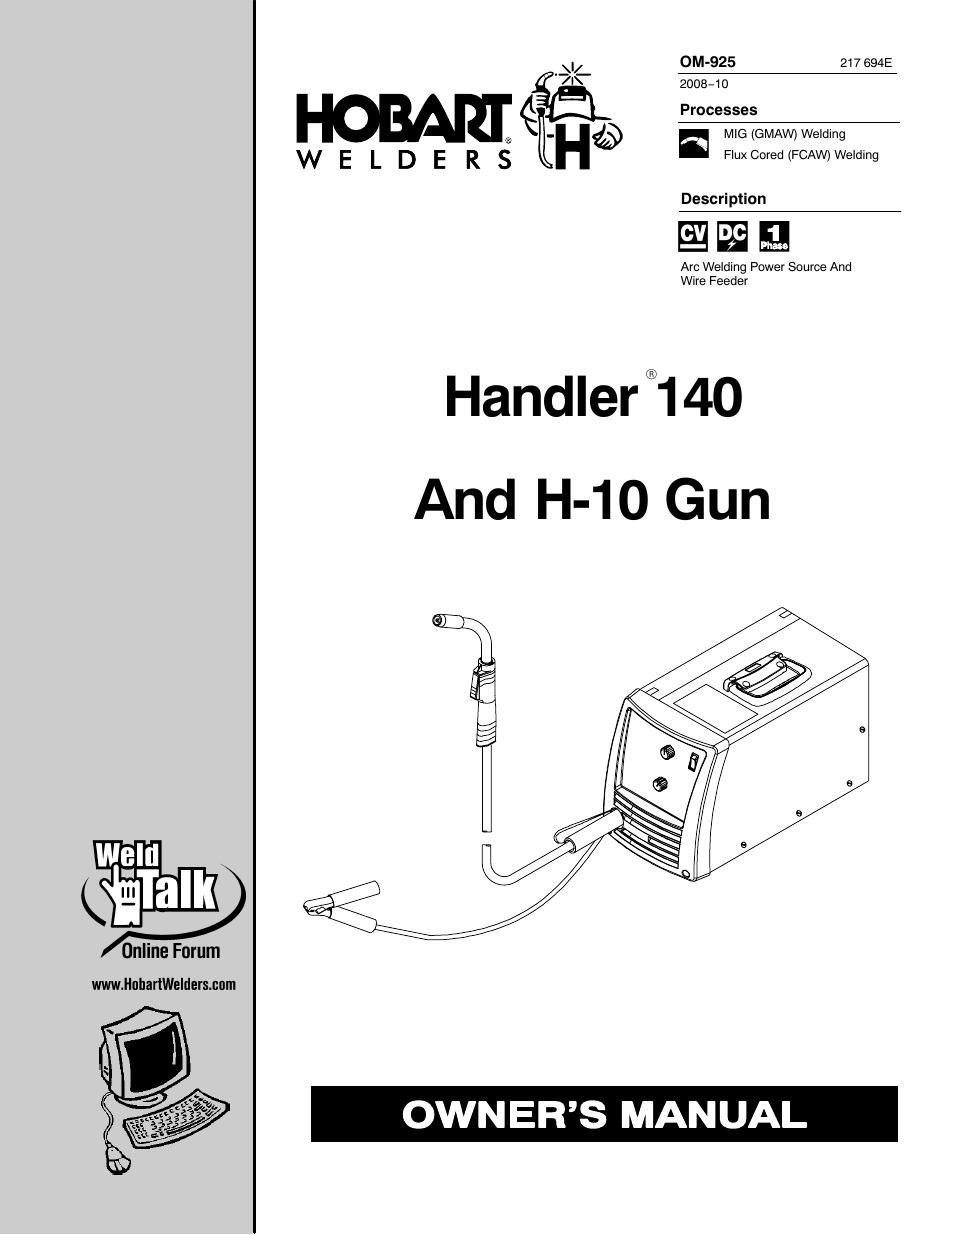 Hobart Welding Products HANDLER 140 OM-925 User Manual